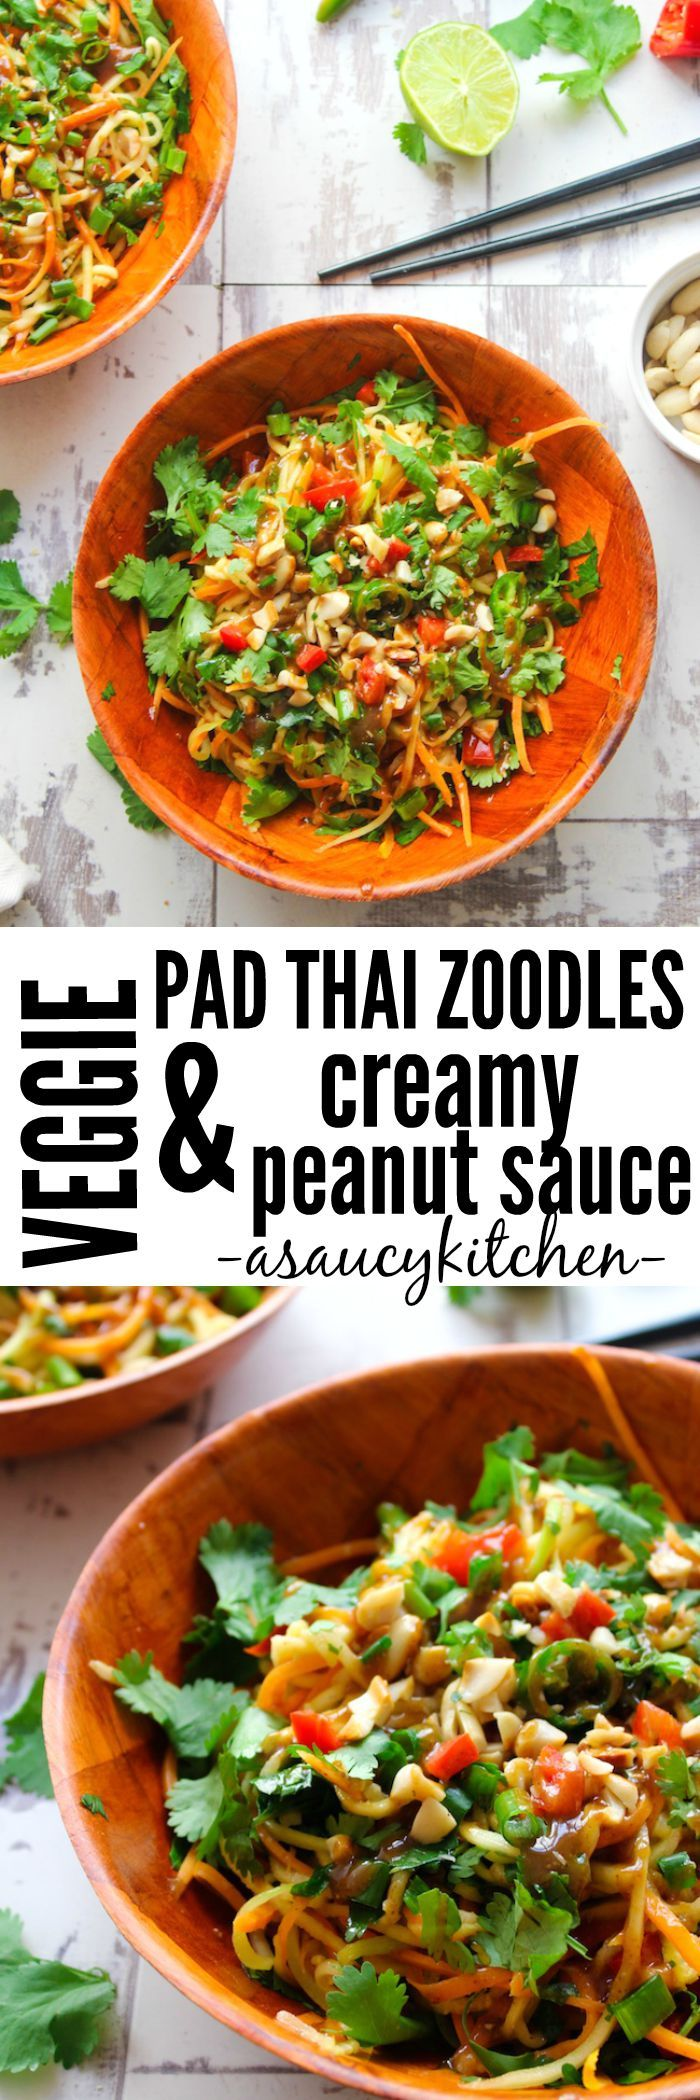 Veggie Pad Thai Zoodles & Peanut Sauce  www.asaucykitchen.com